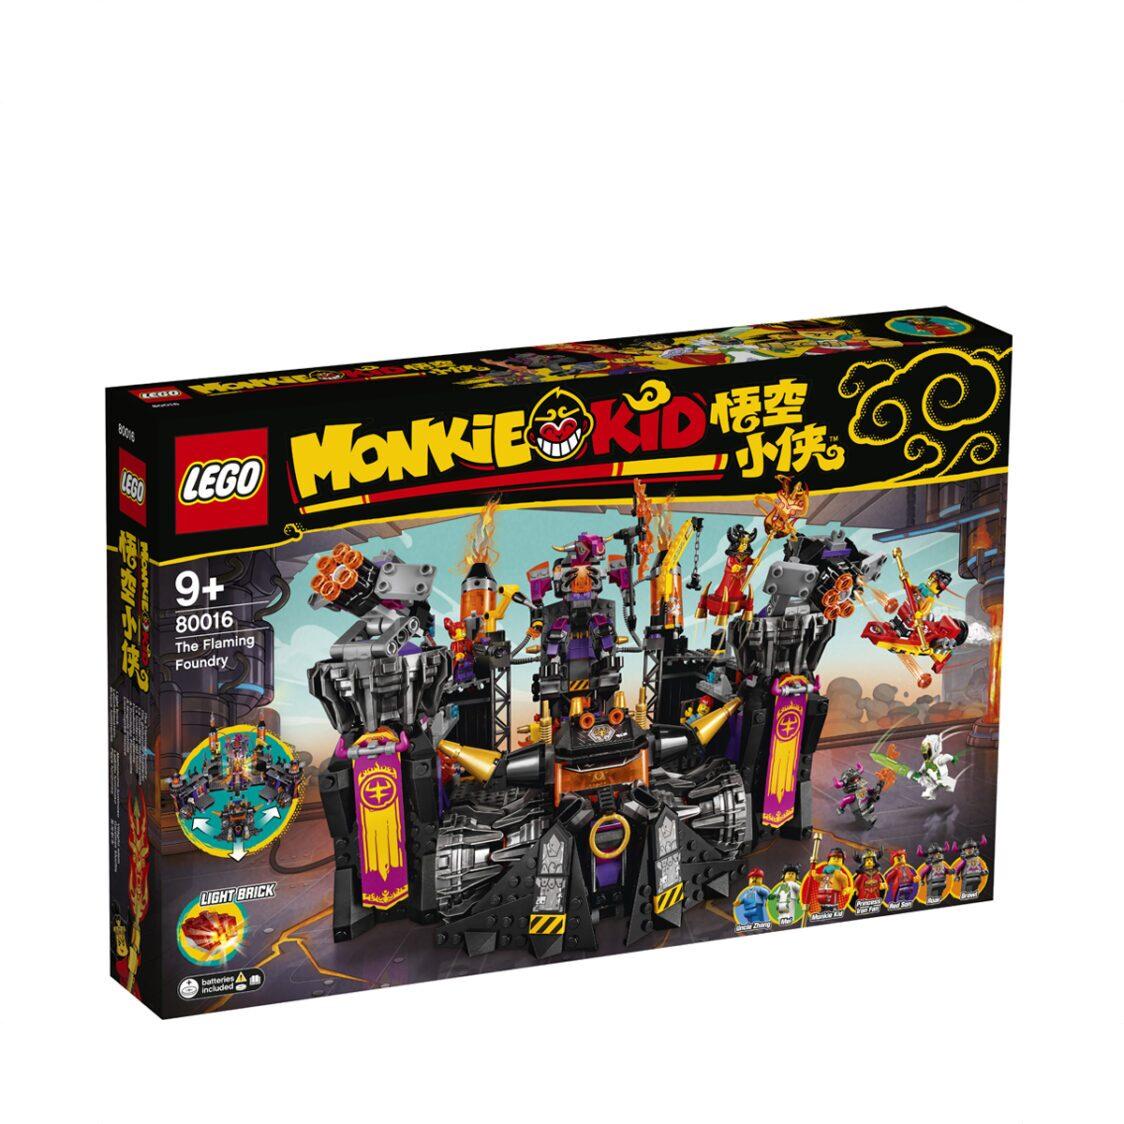 LEGO The Flaming Foundry 80016 V29